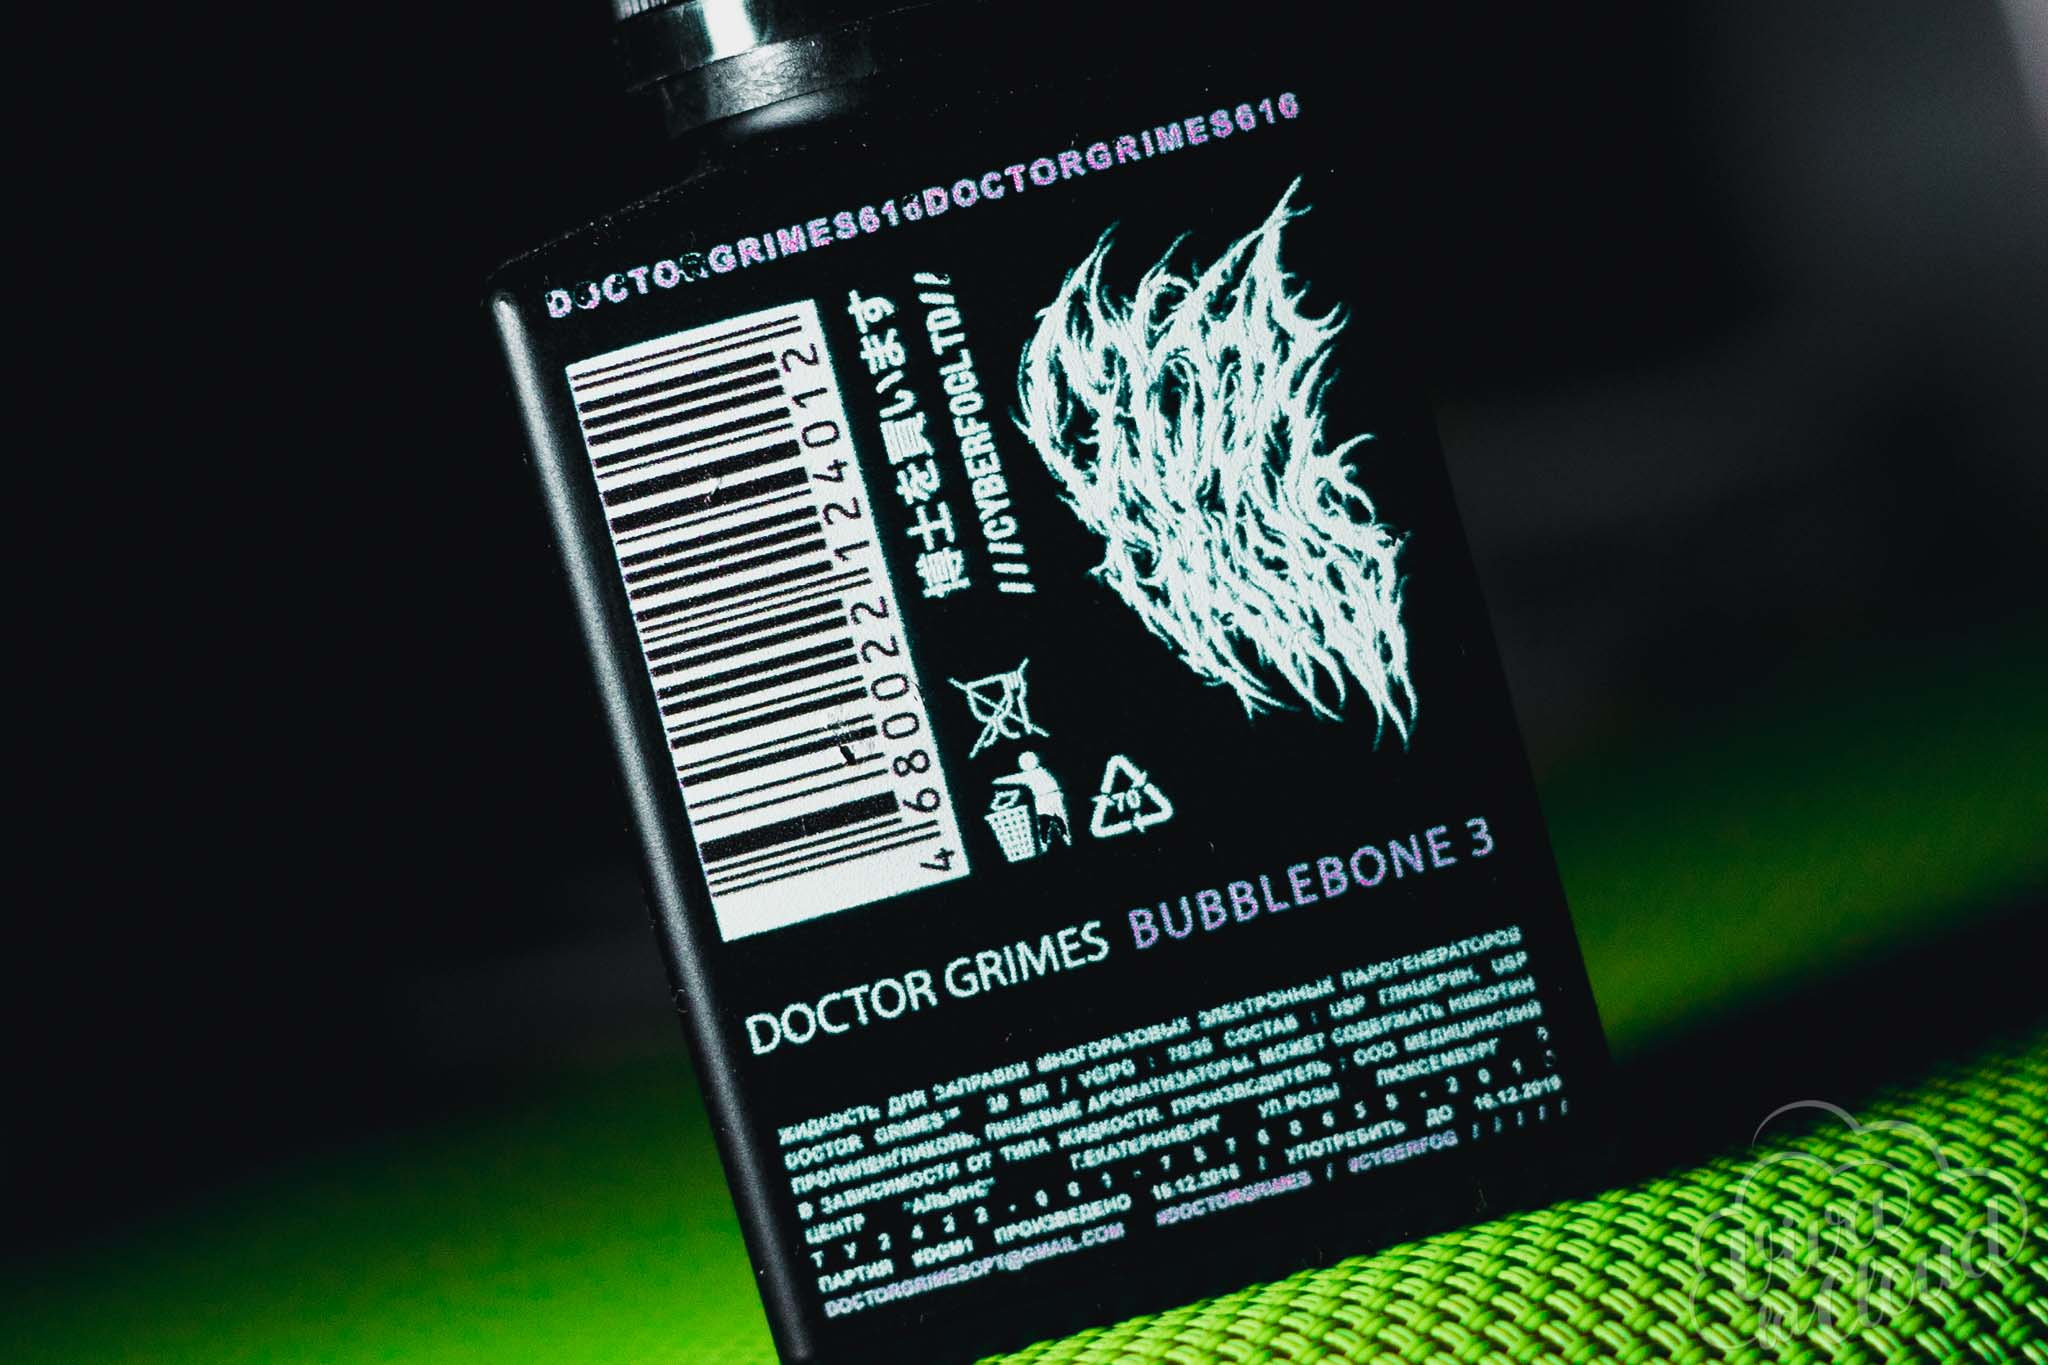 DOCTOR GRIMES